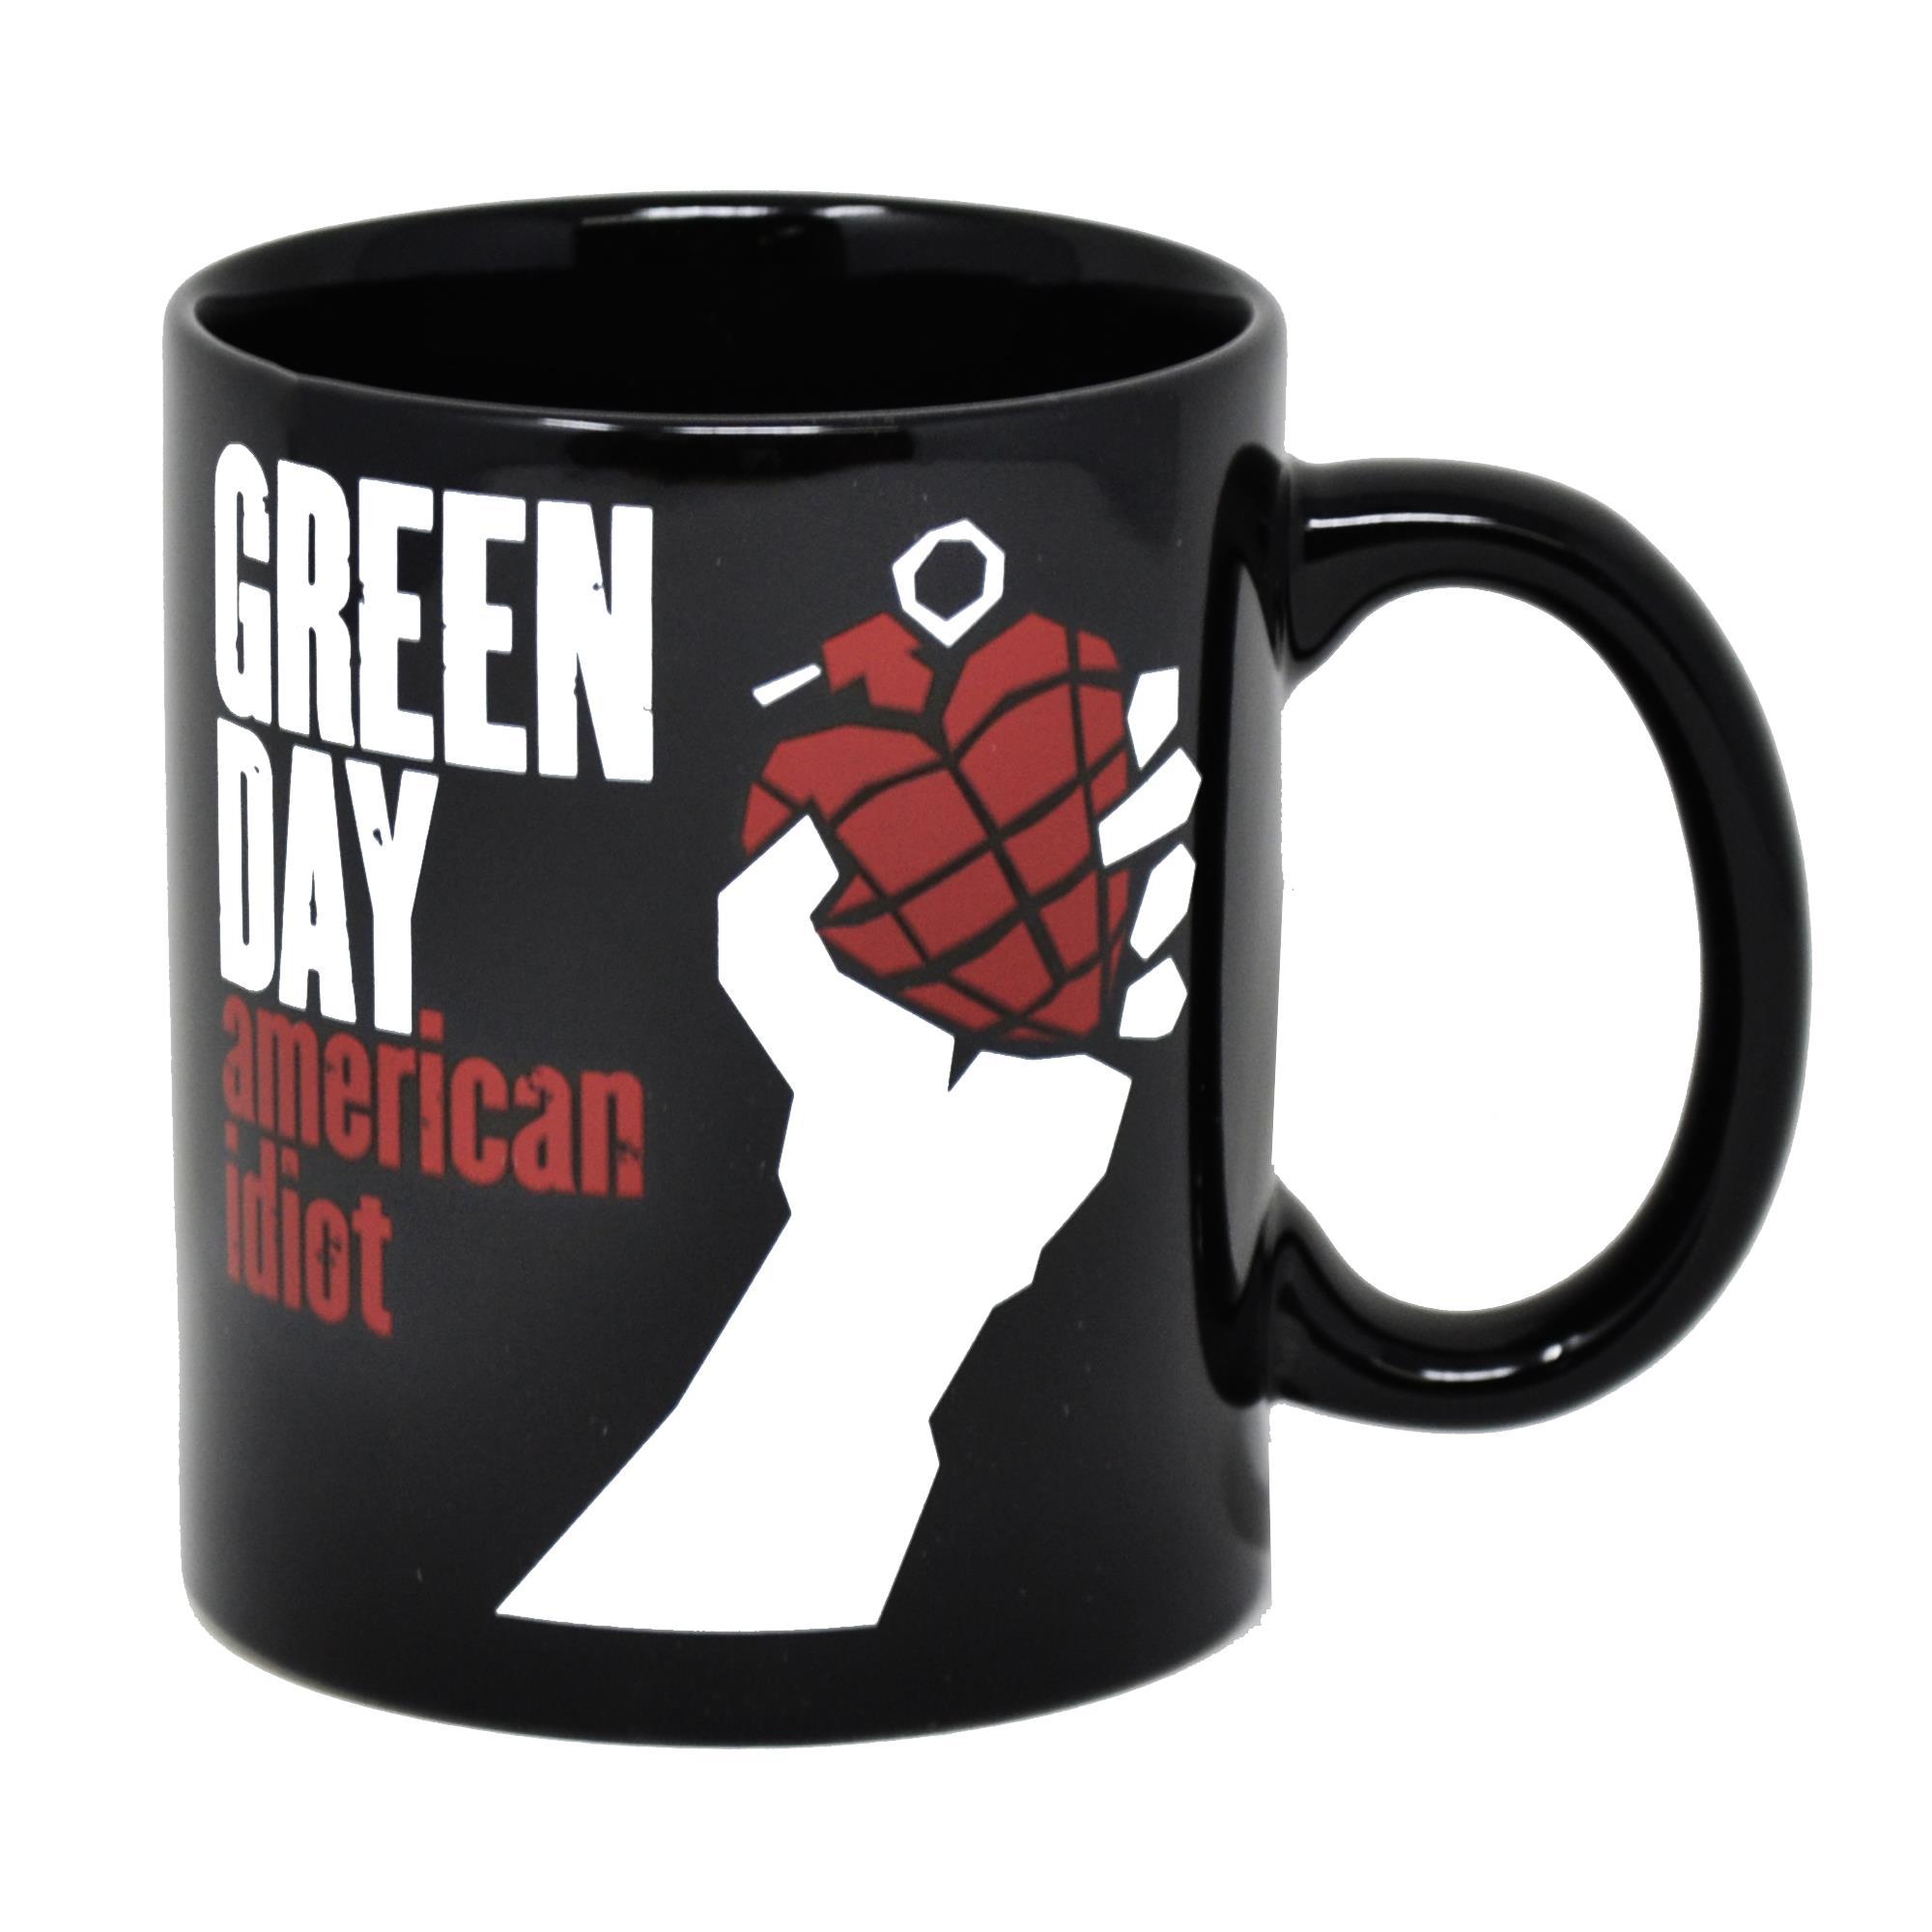 American Idiot Mug